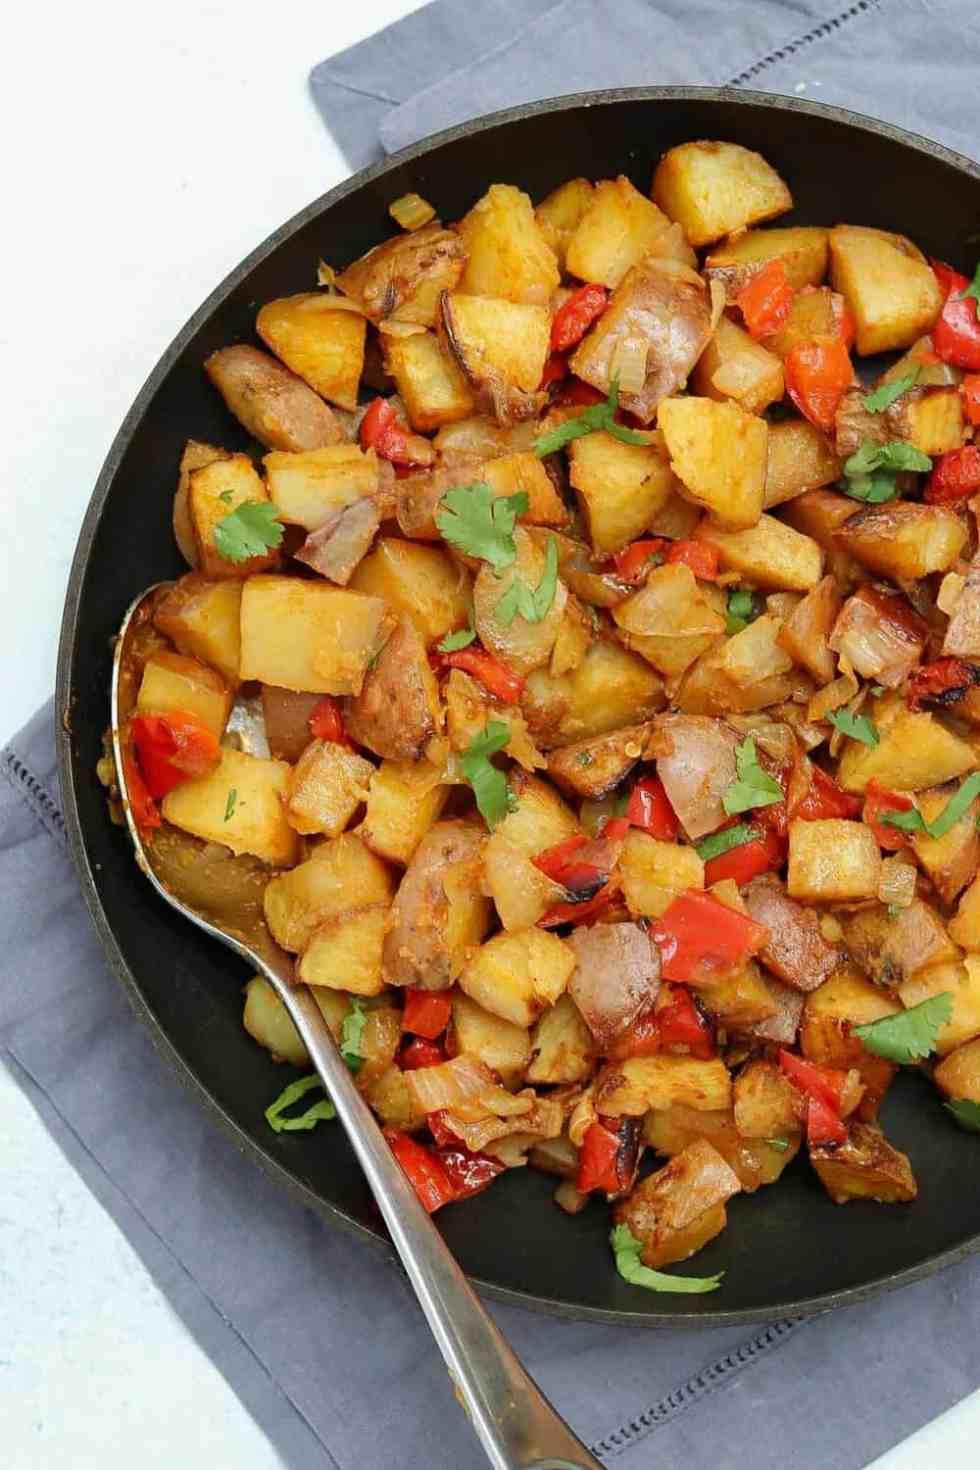 Crispy roasted breakfast potatoes in a black skillet on a grey napkin.